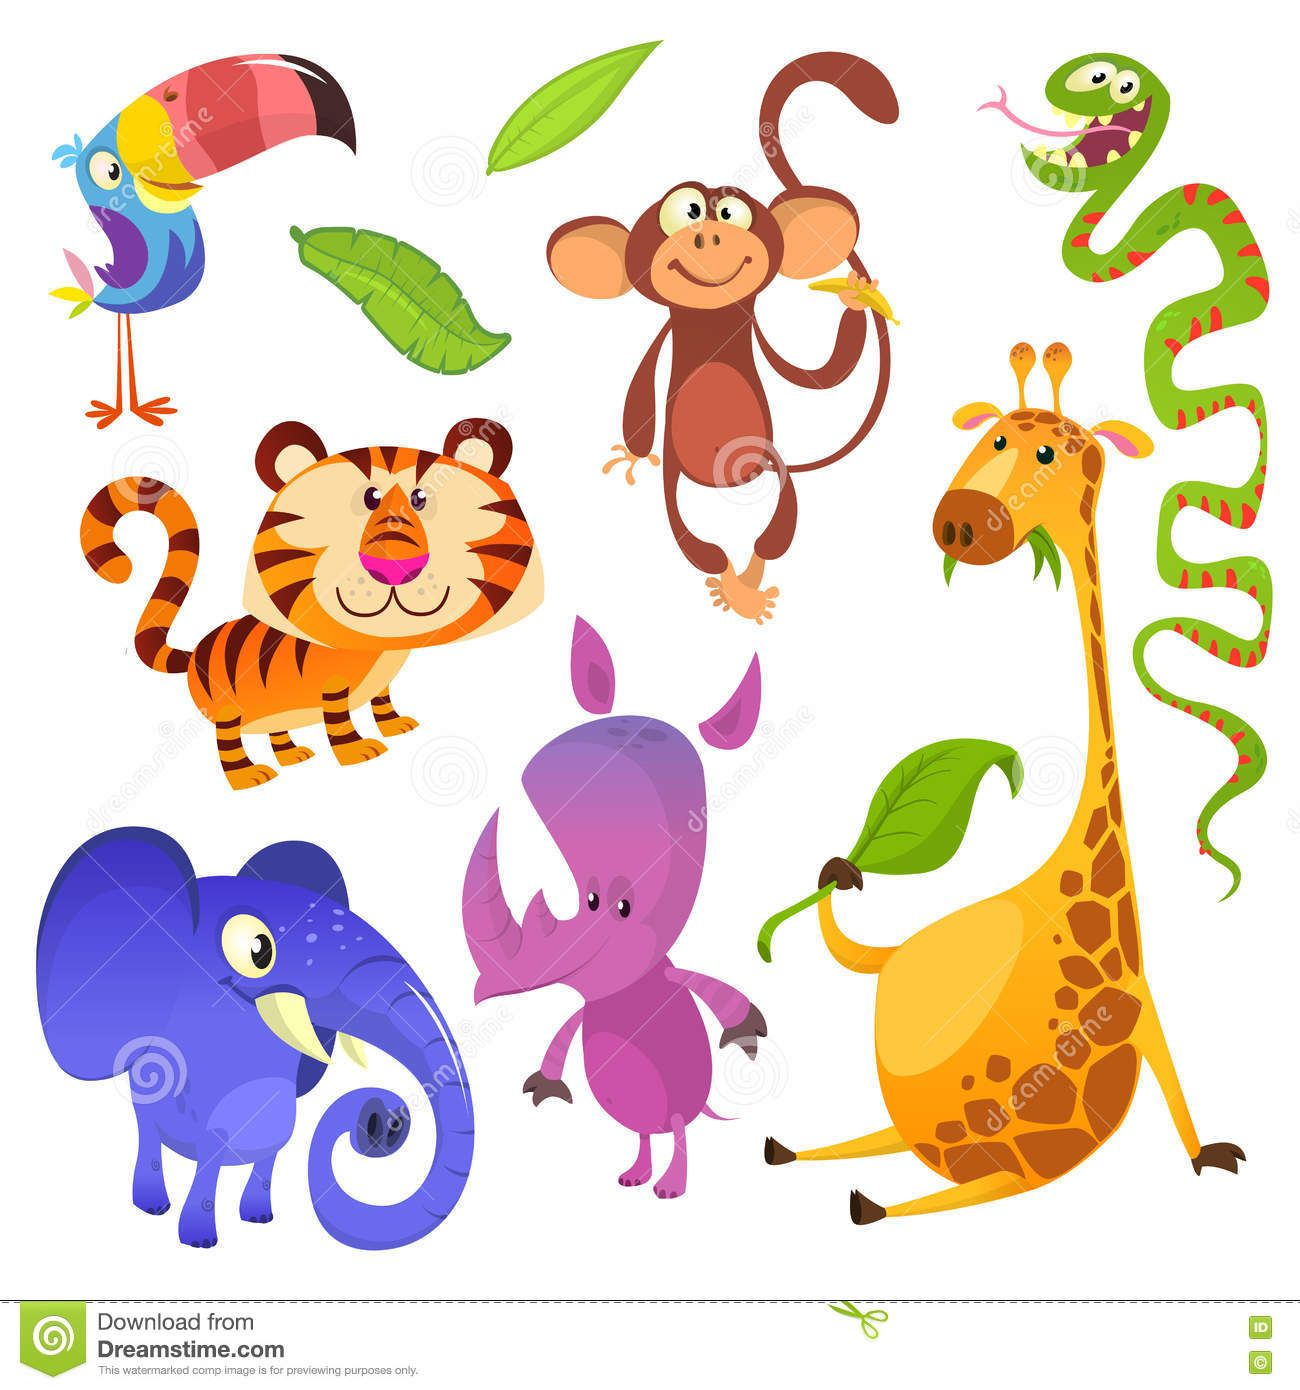 Cartoon Tropical Animal Characters Wild Cartoon Cute Animals Collections Vector Big Set Of Cartoon Ju Cartoon Jungle Animals Tropical Animals African Animals